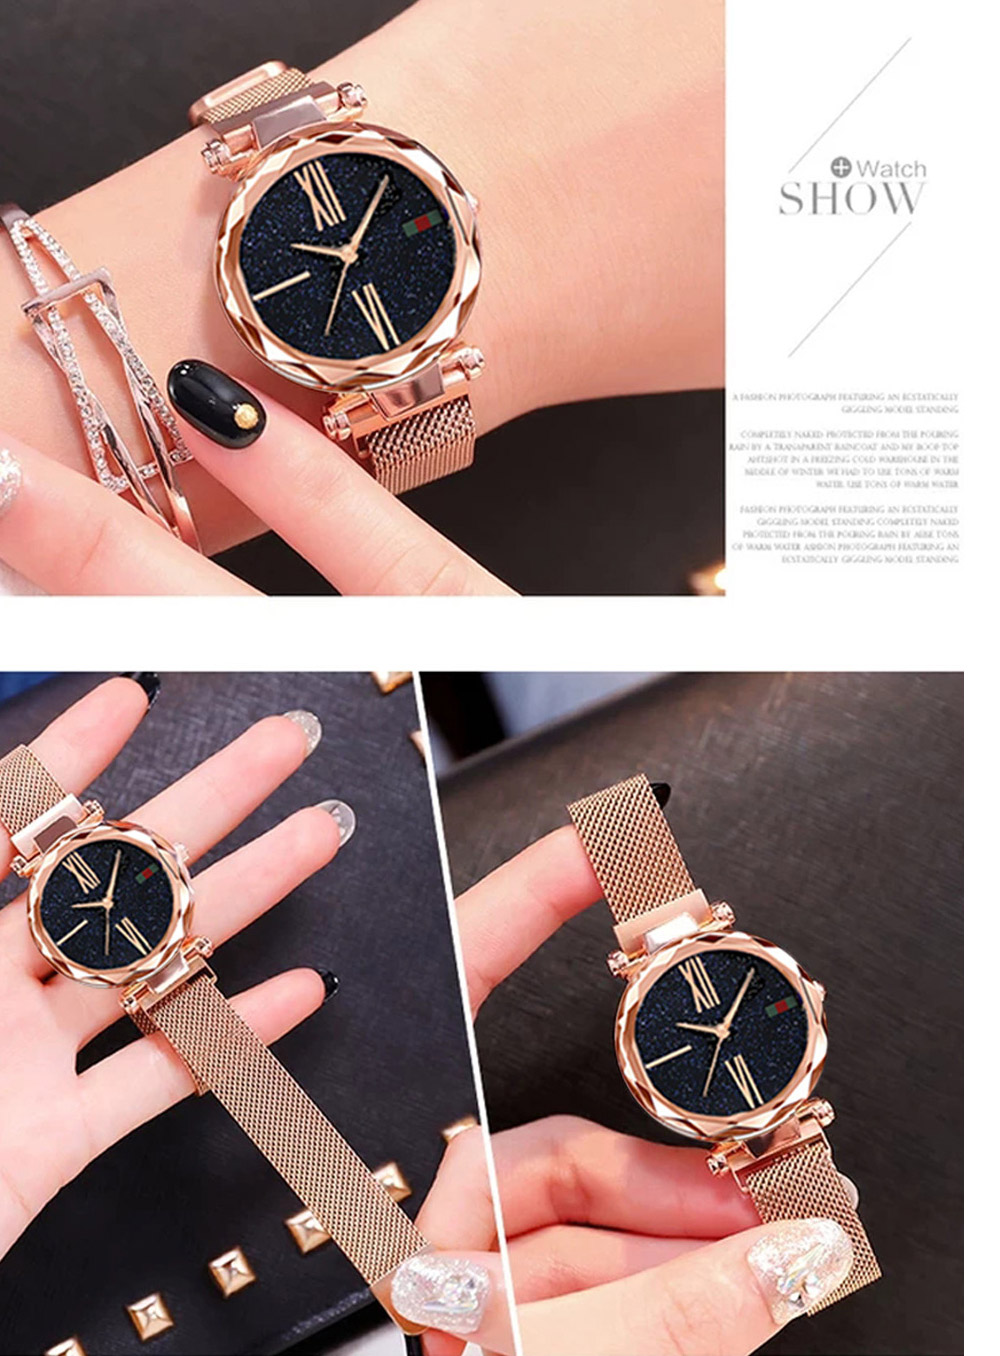 Relojes de lujo chapa oro rosa para mujer 11